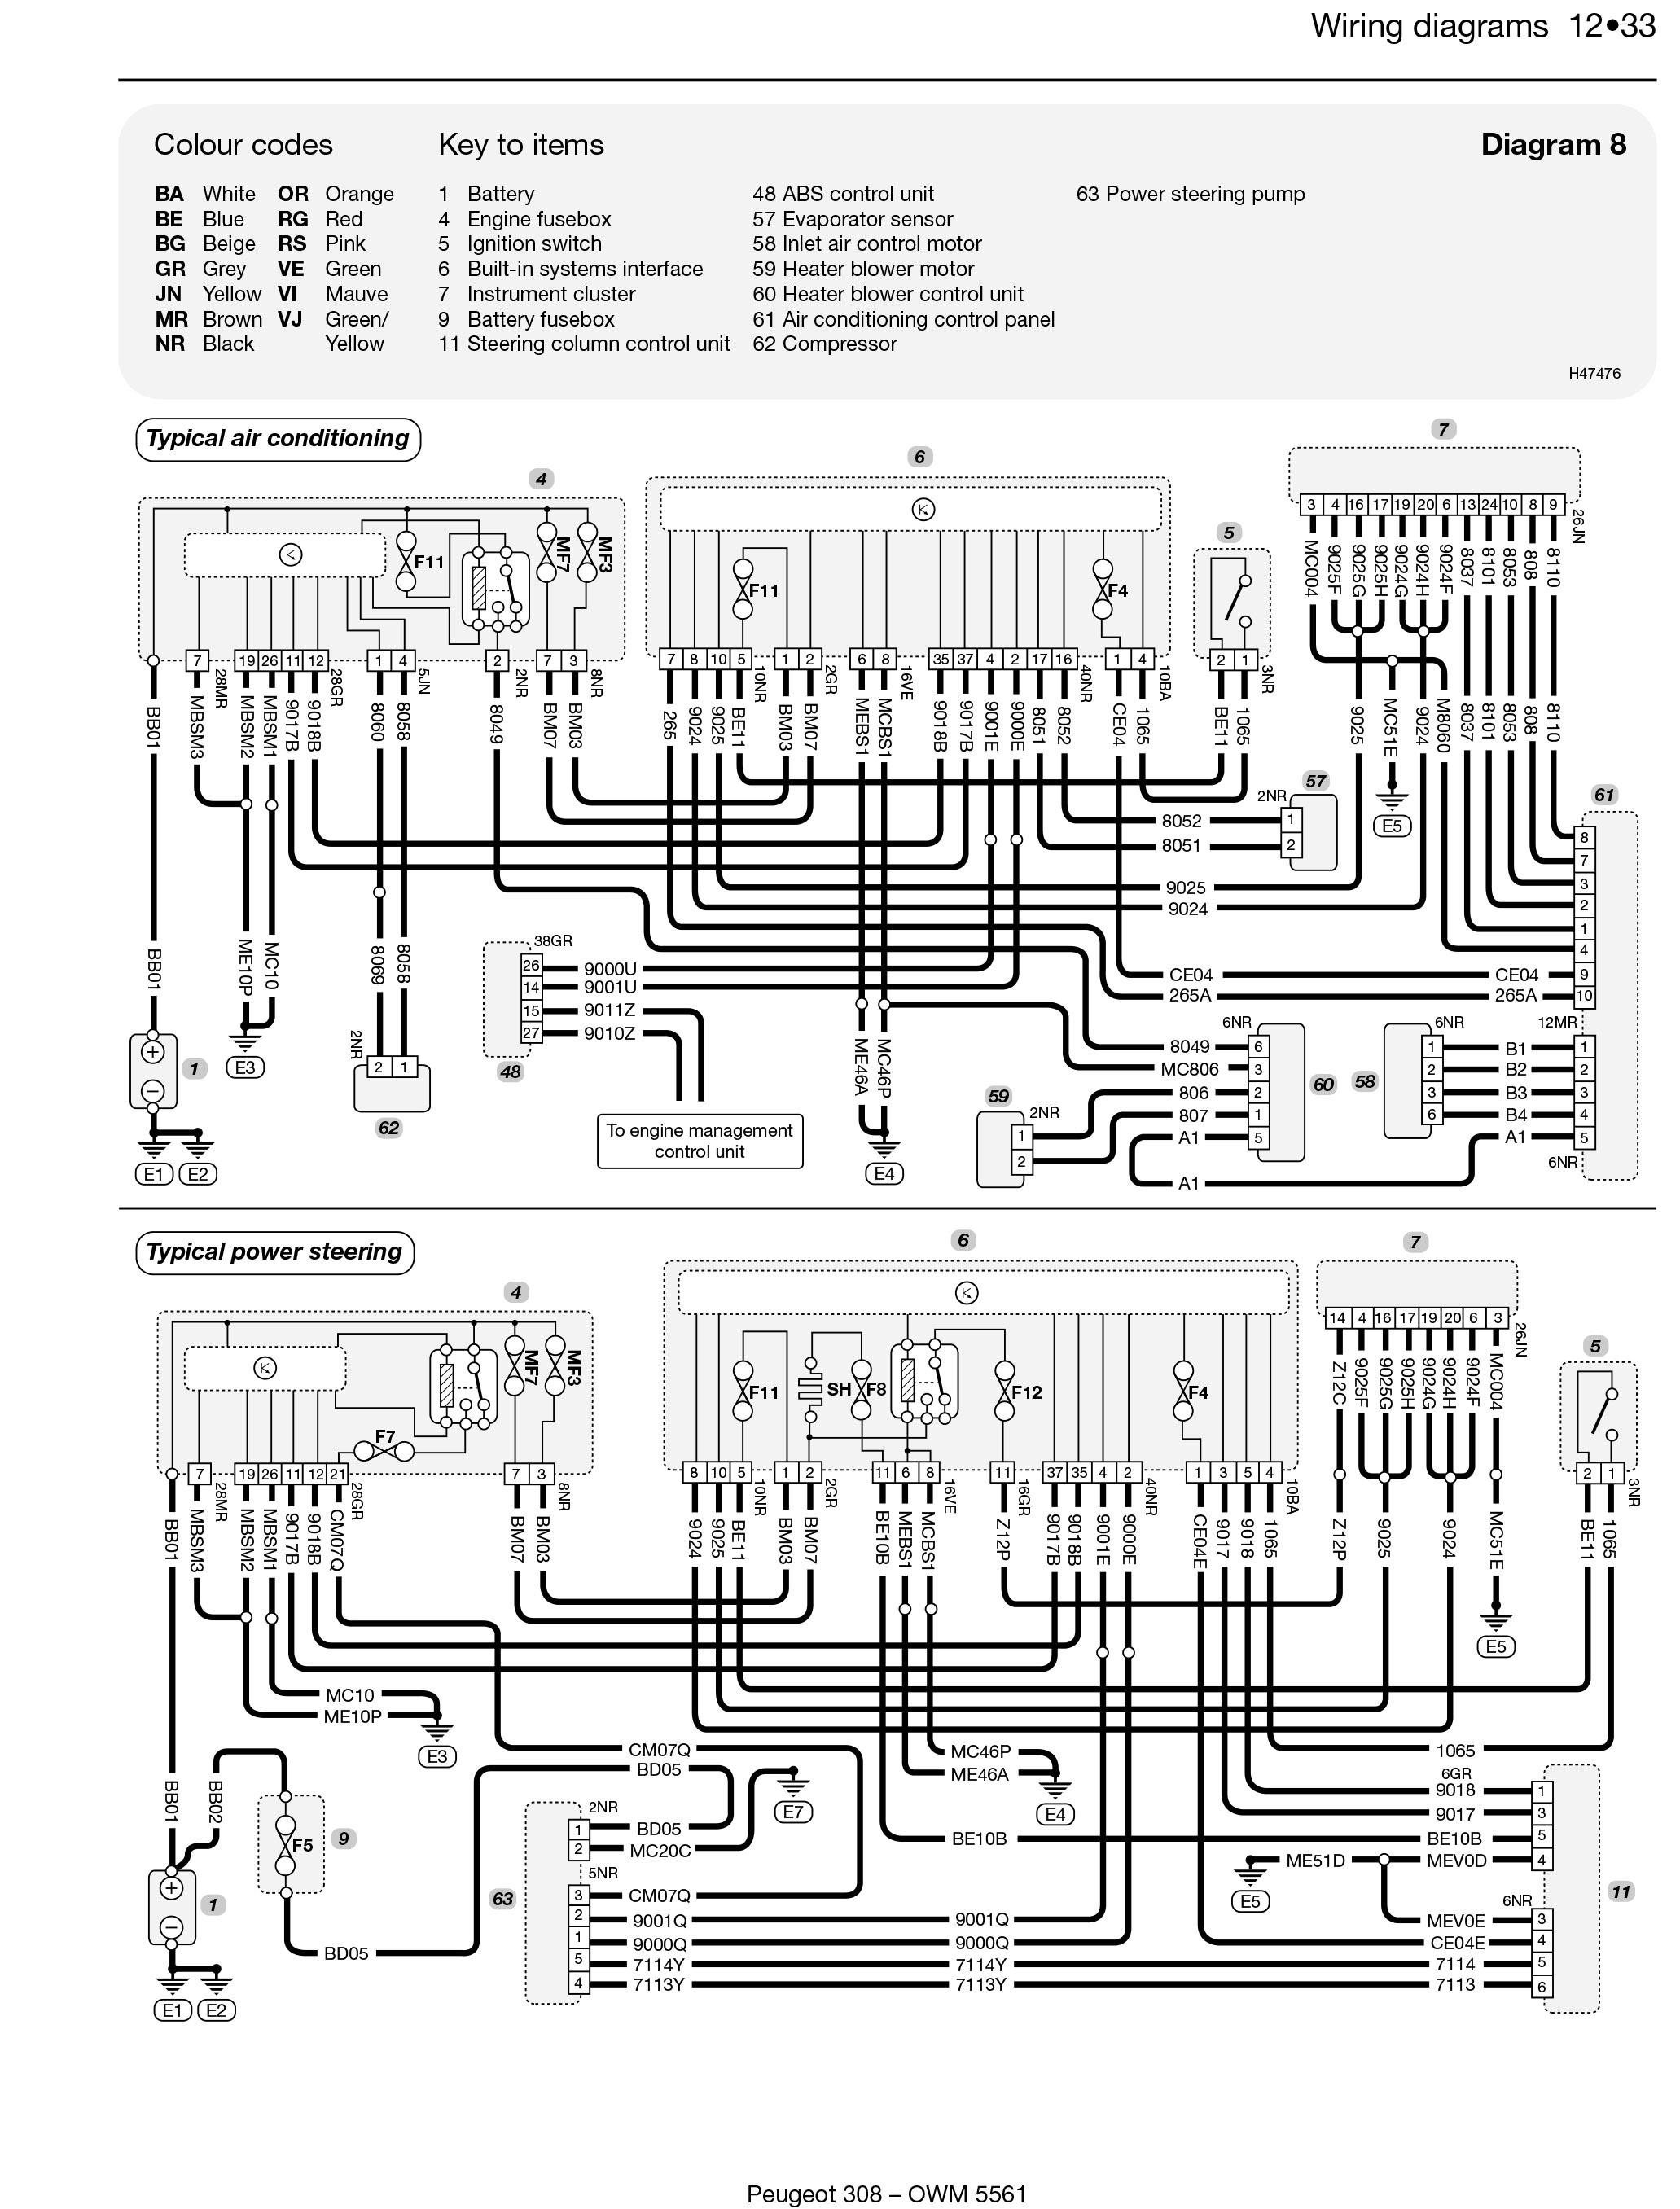 [QNCB_7524]  BT_6647] 307 Engine Fuse Box Diagram Moreover Cooling Fan Wiring Diagram  Wiring Diagram | Gm 308 Engine Diagram |  | Bemua Kapemie Mohammedshrine Librar Wiring 101